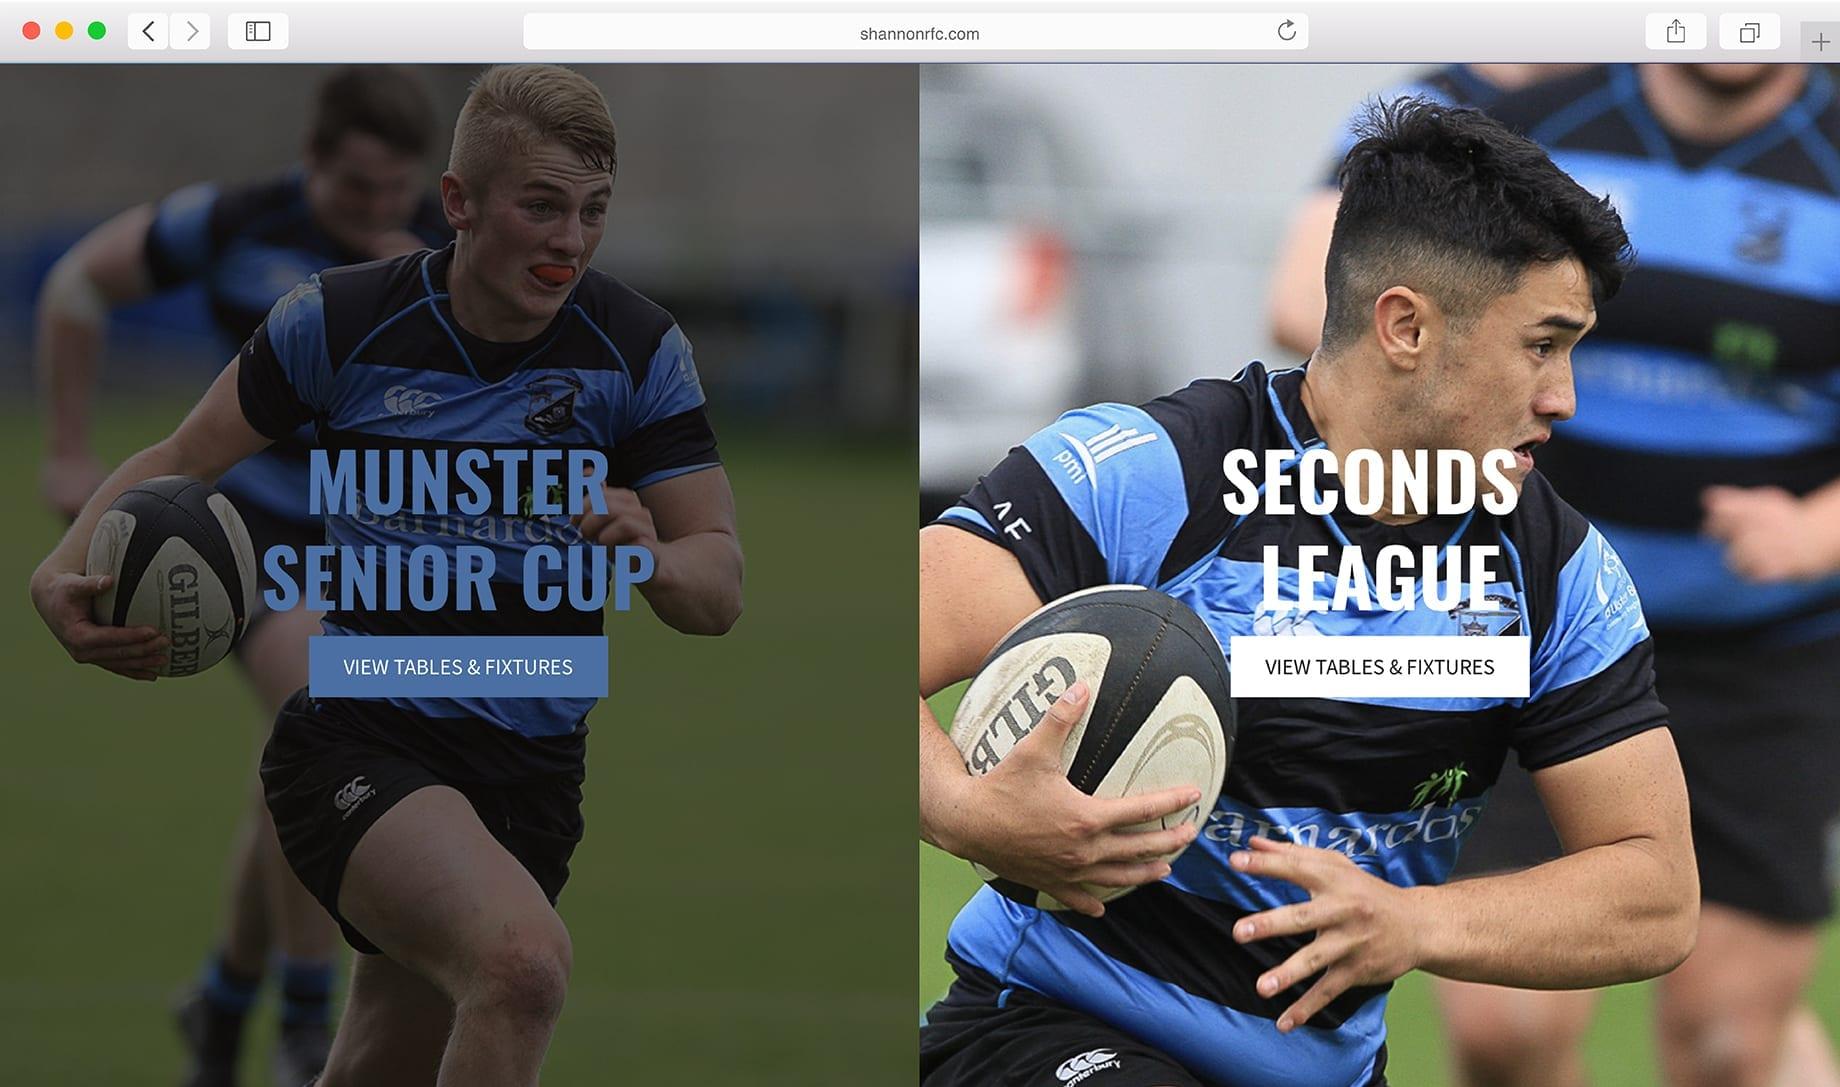 Shannon Website Design Screenshot